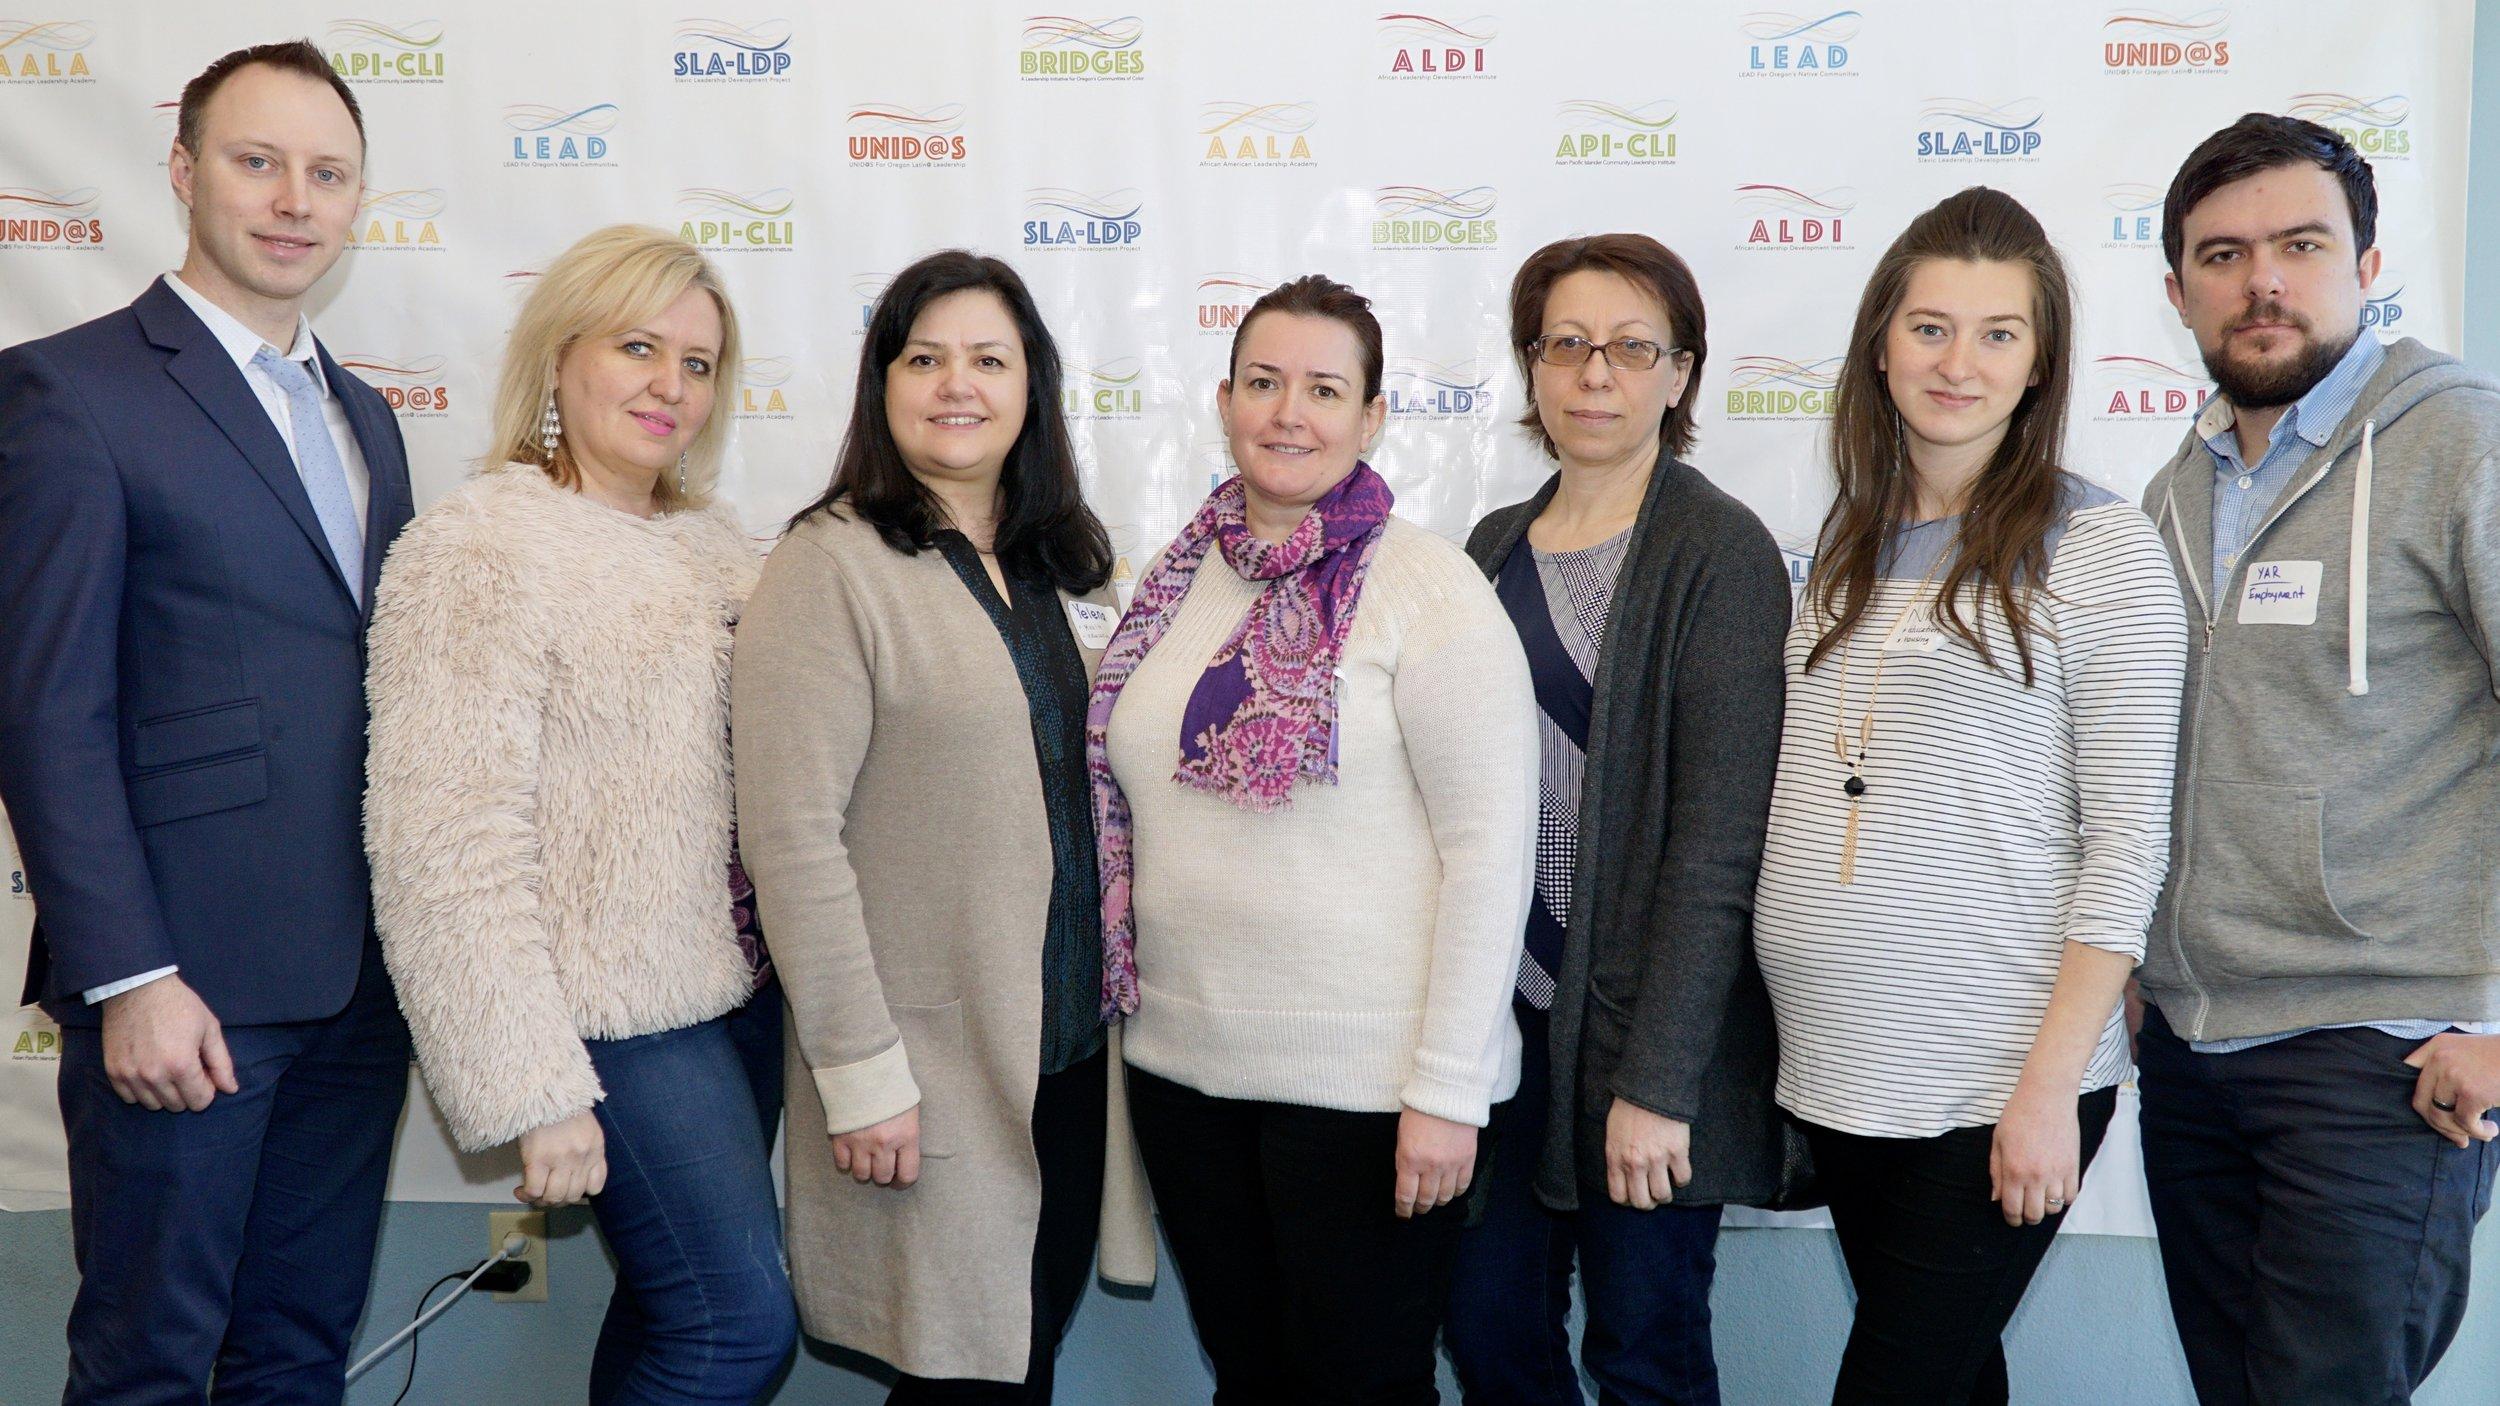 Slavic Leadership Development Project (SLA-LDP)